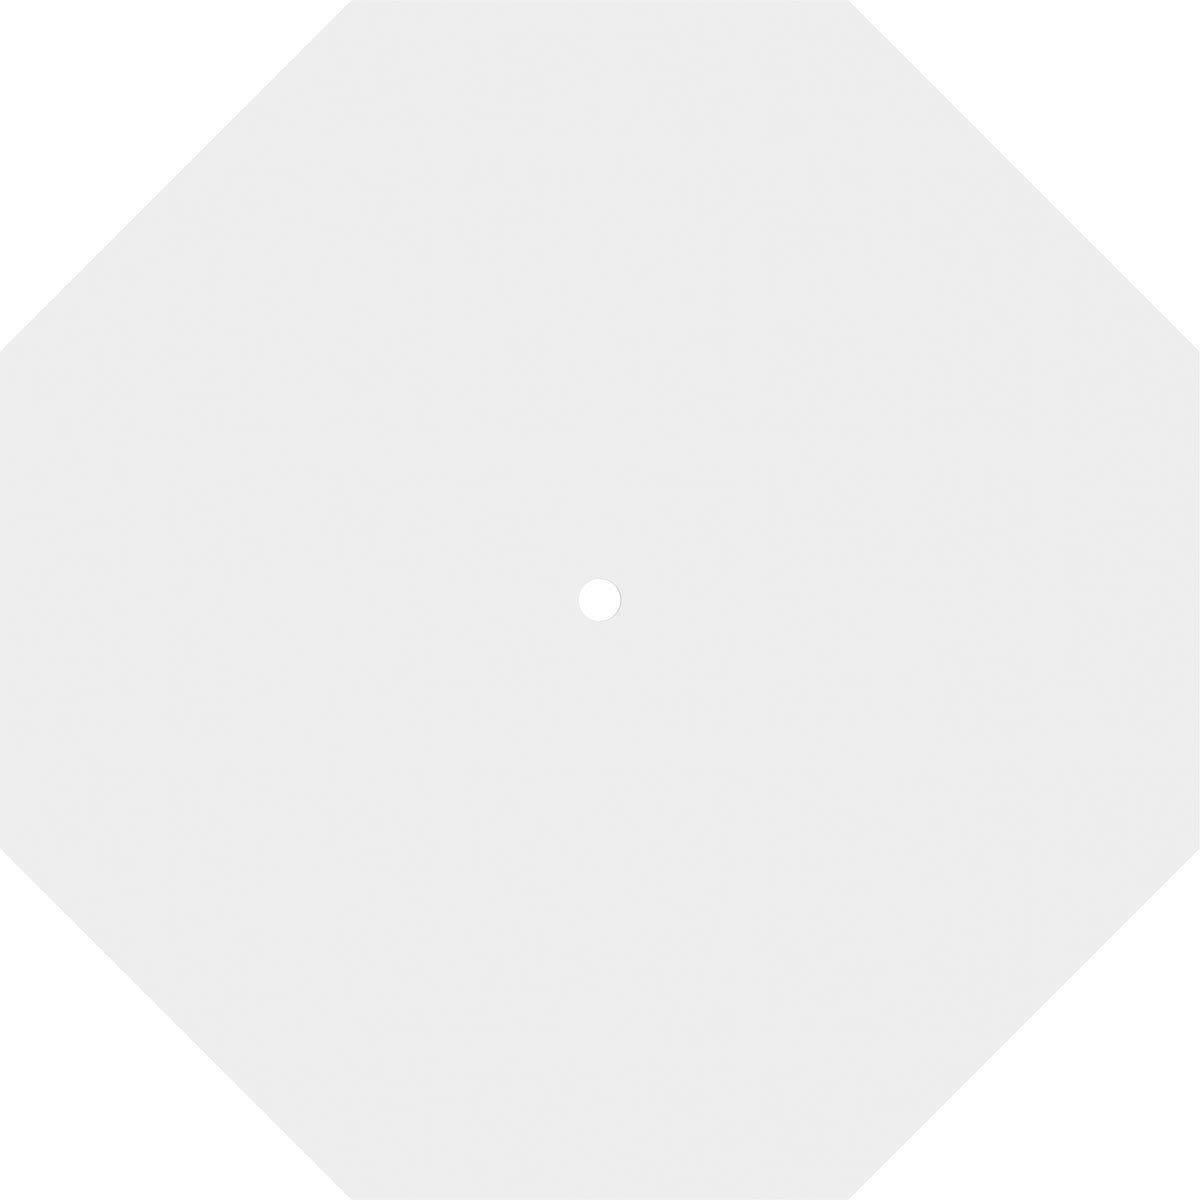 Ekena Millwork CMP28WN-01000 Ceiling Medallion 28OD x 1ID x 11C x 1P White